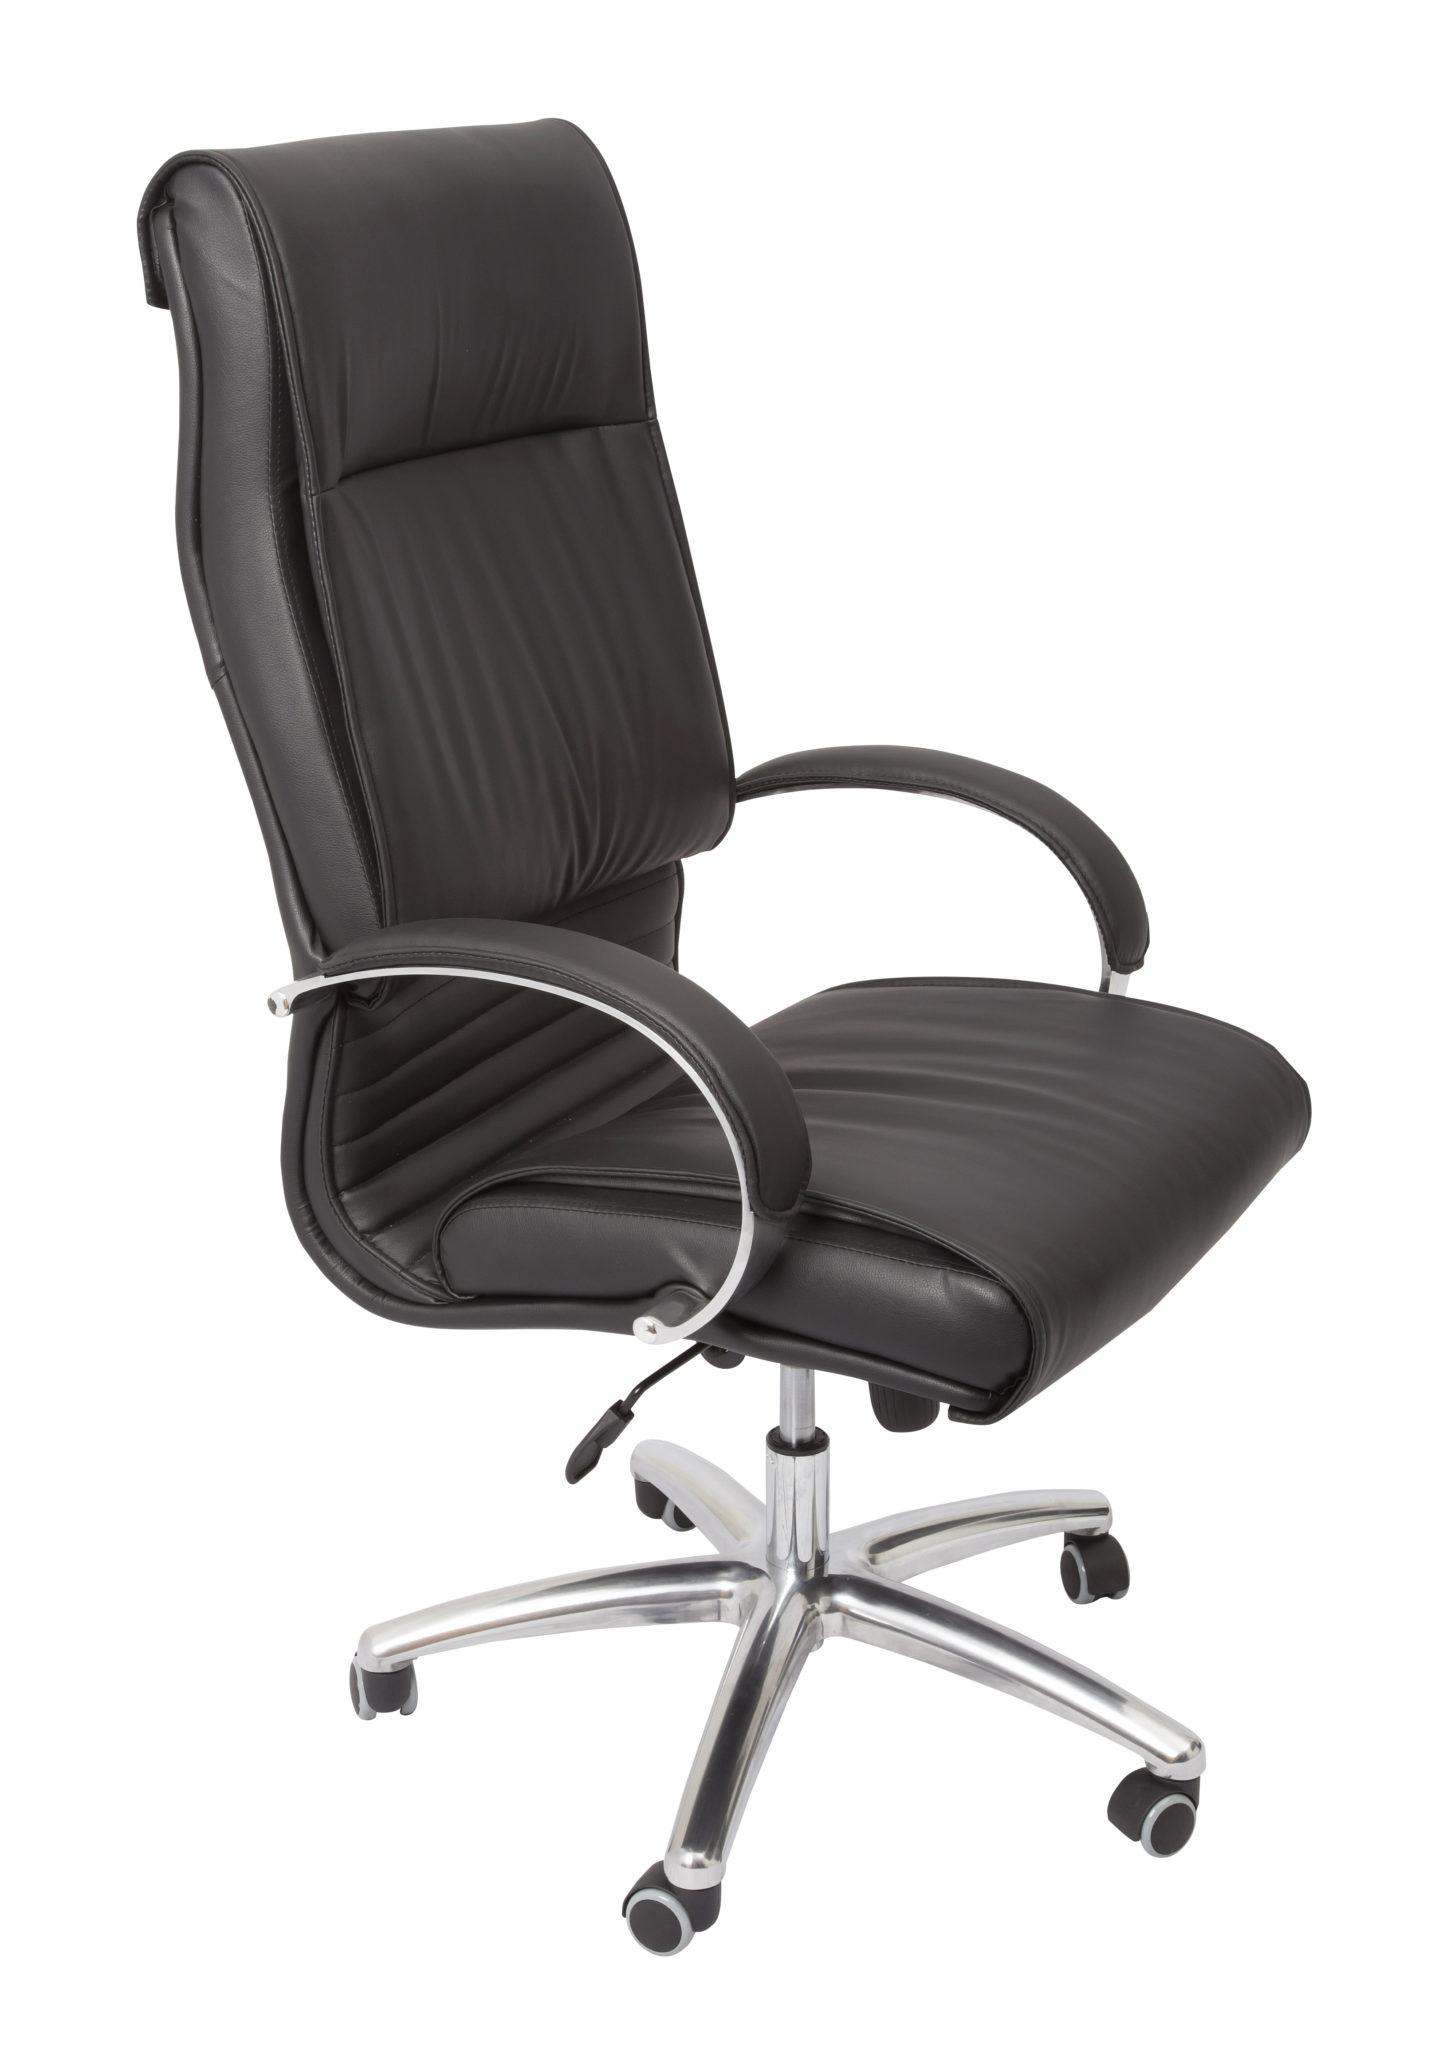 CL820 Executive Chair PU